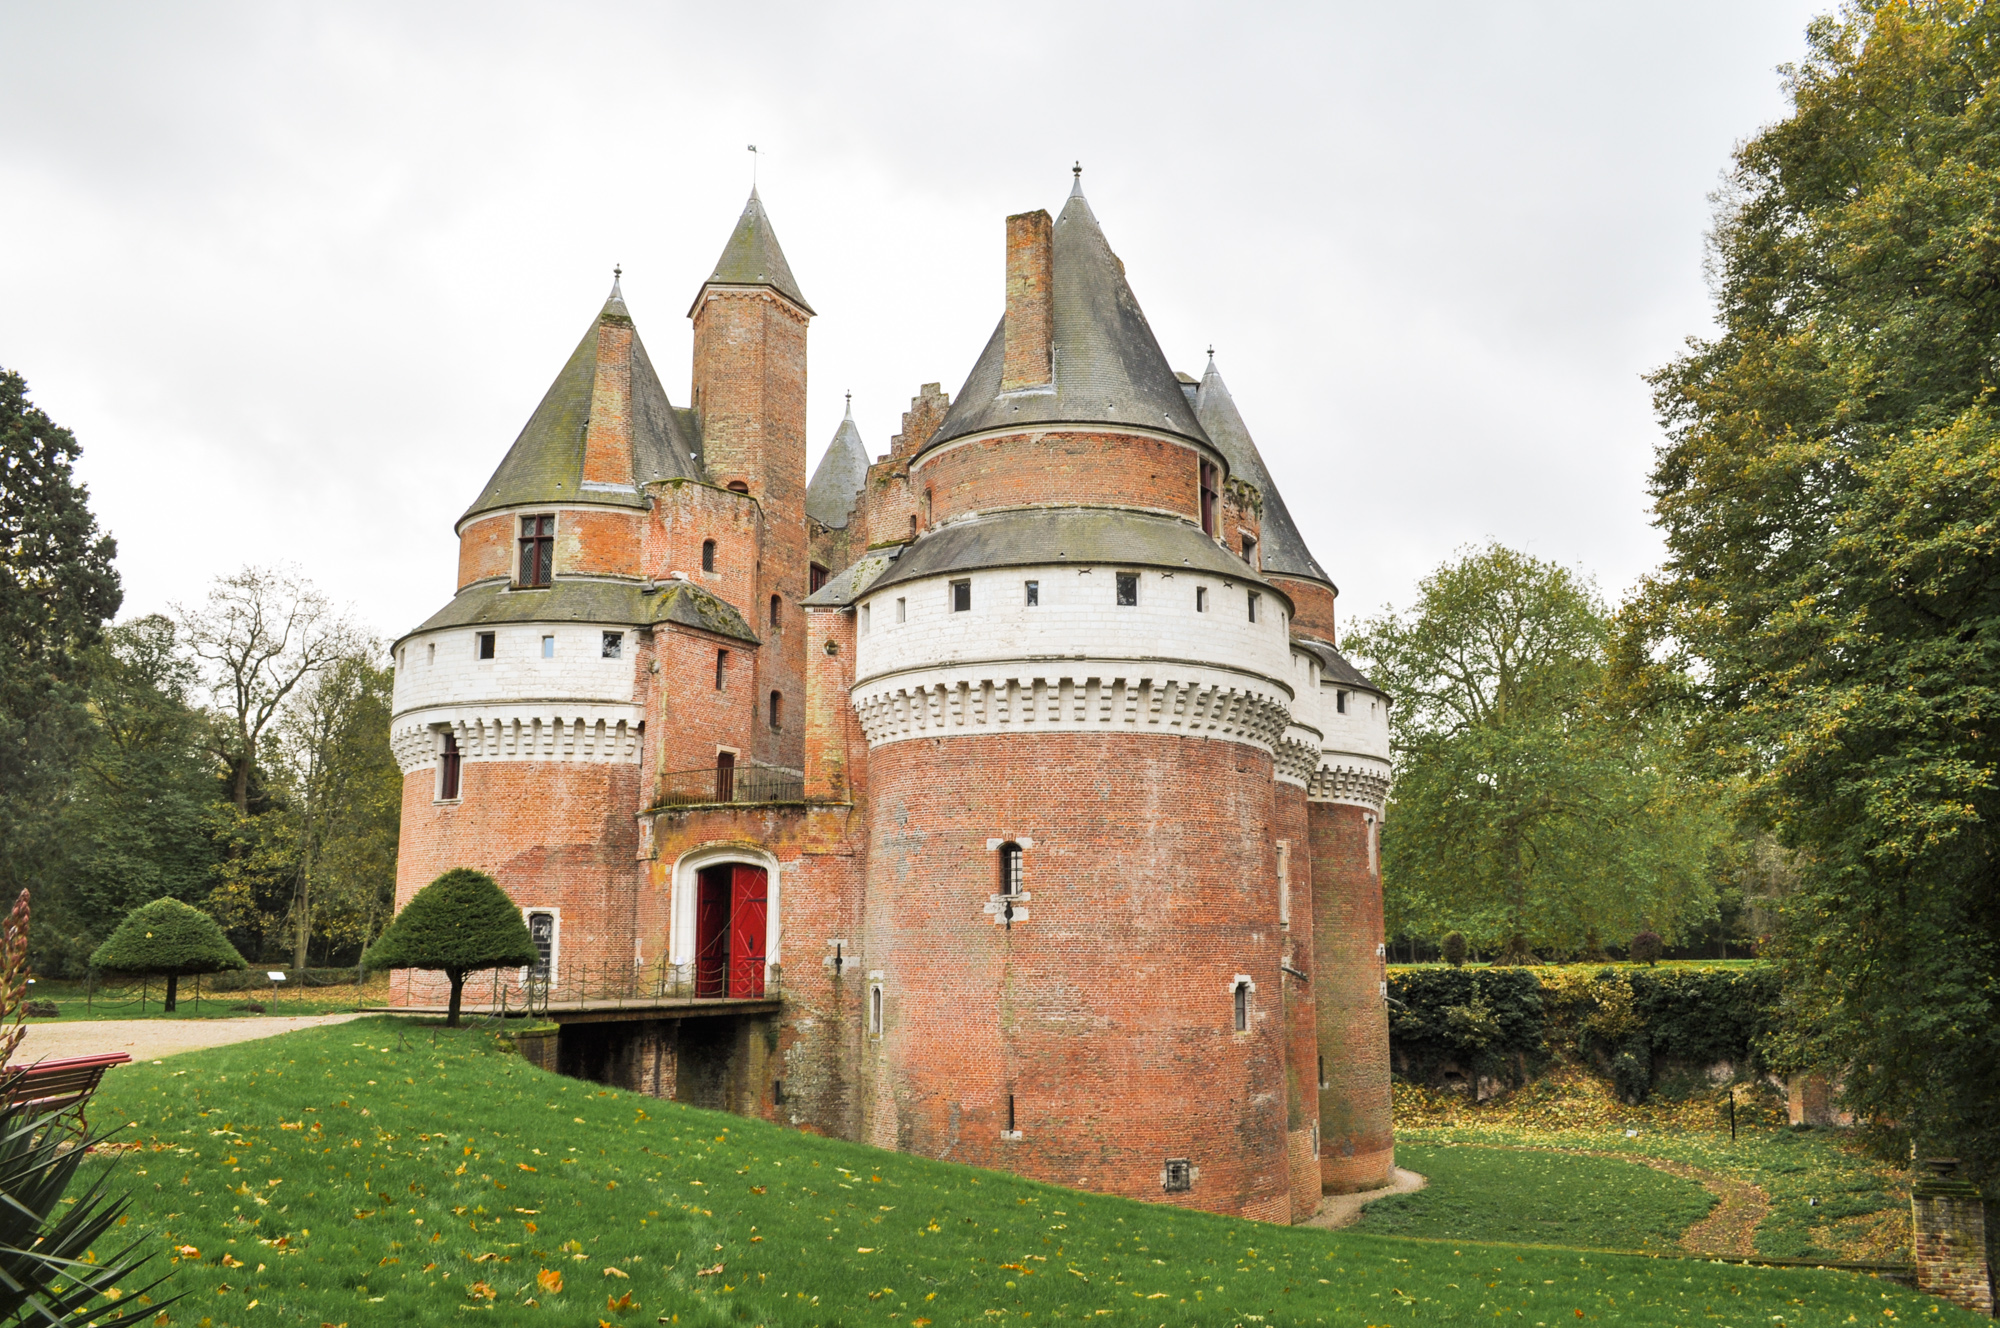 Rambures castle (at 40 min.)